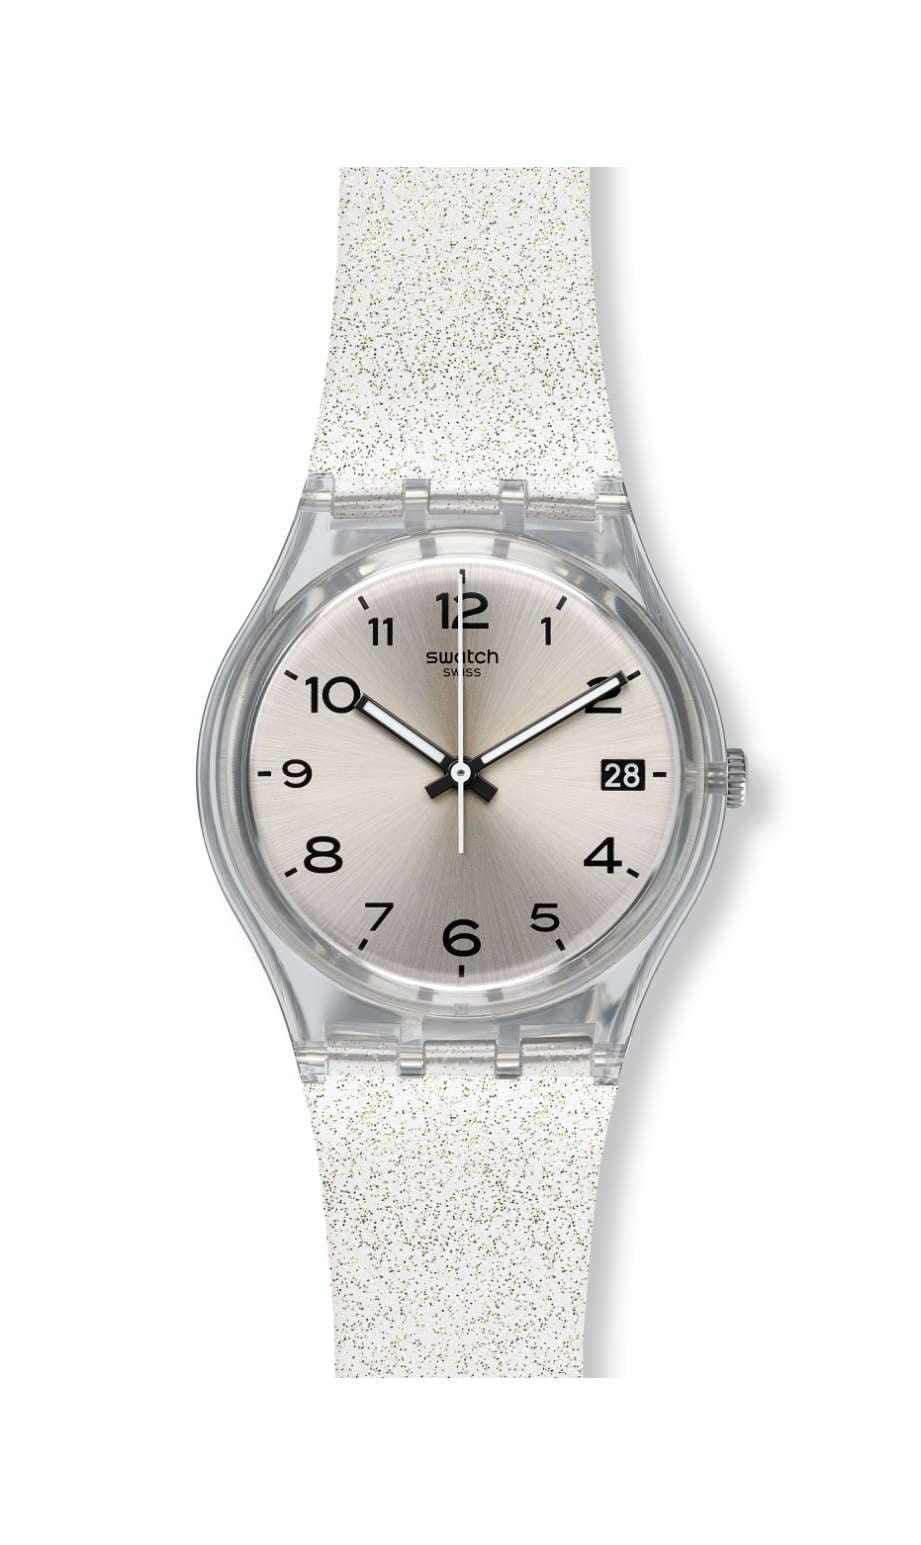 Swatch - SILVERBLUSH - 1